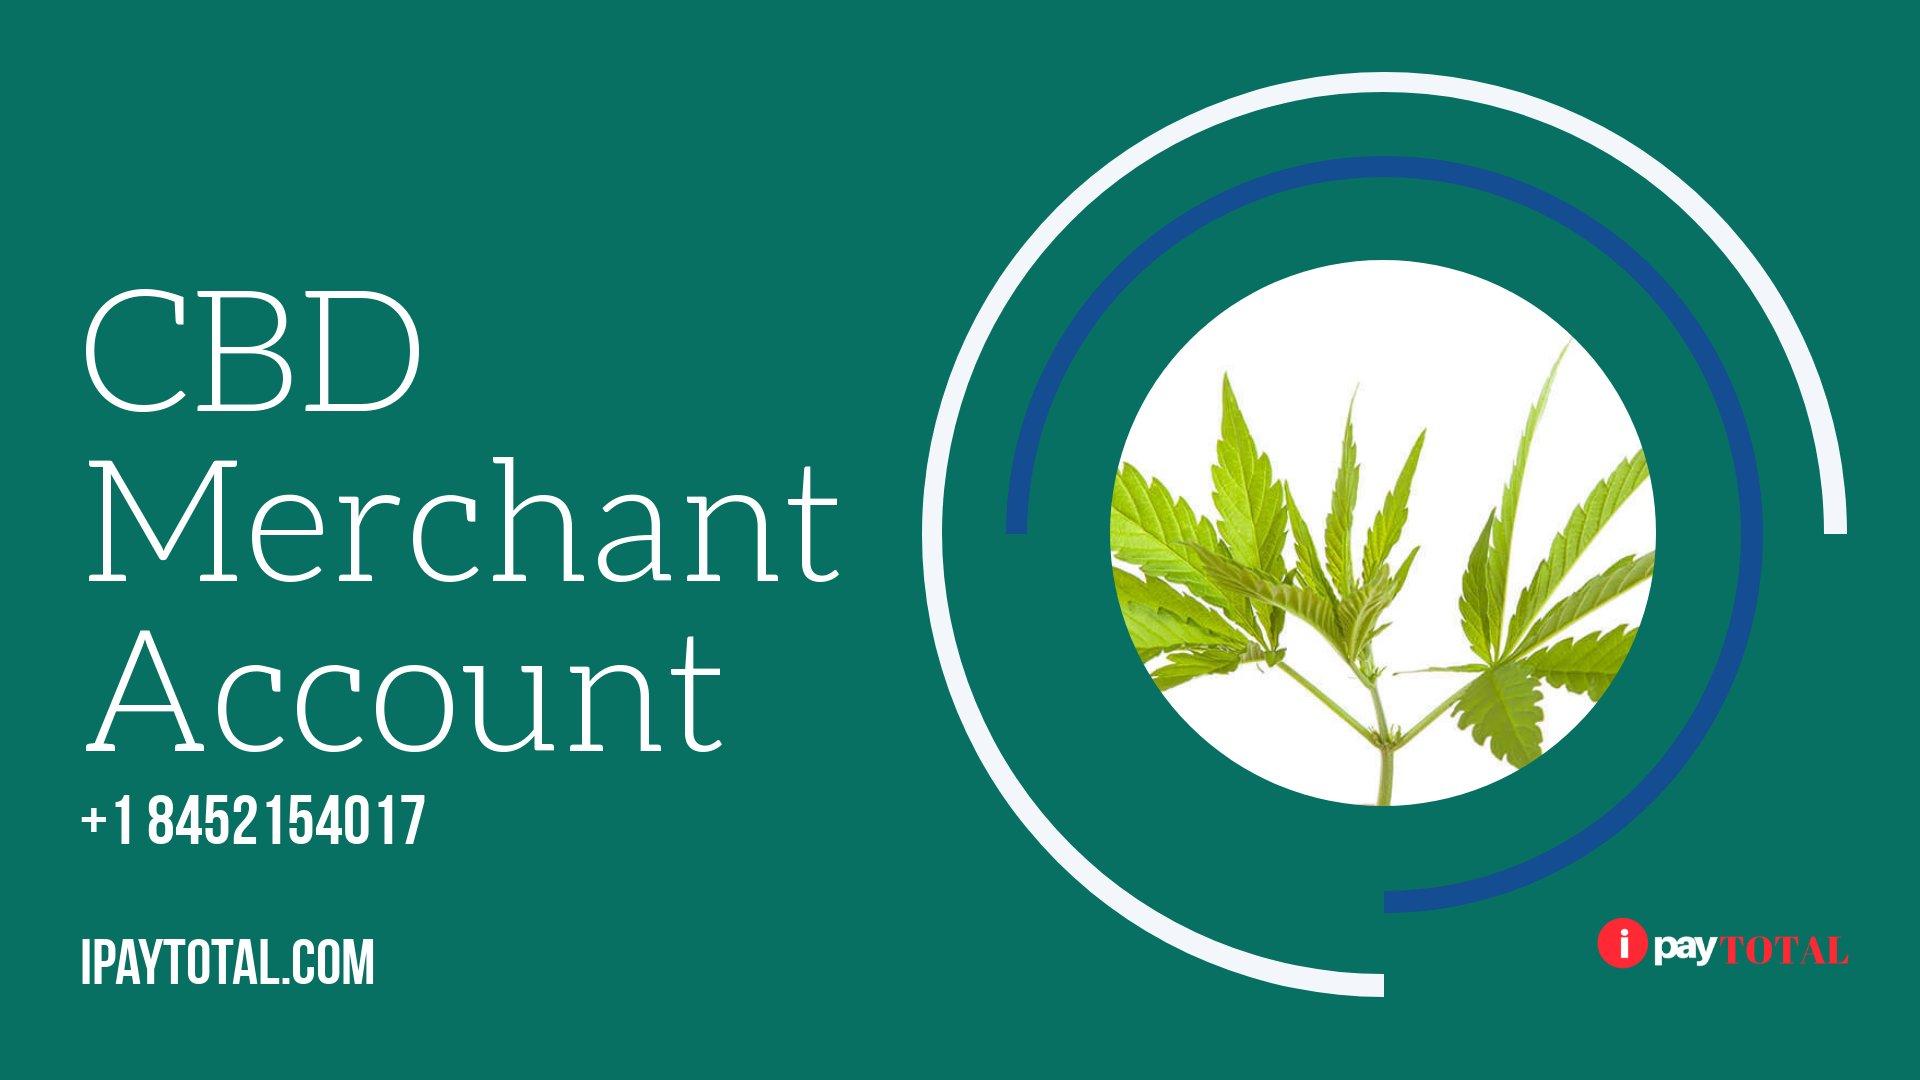 Cbd Merchant Account Shopify